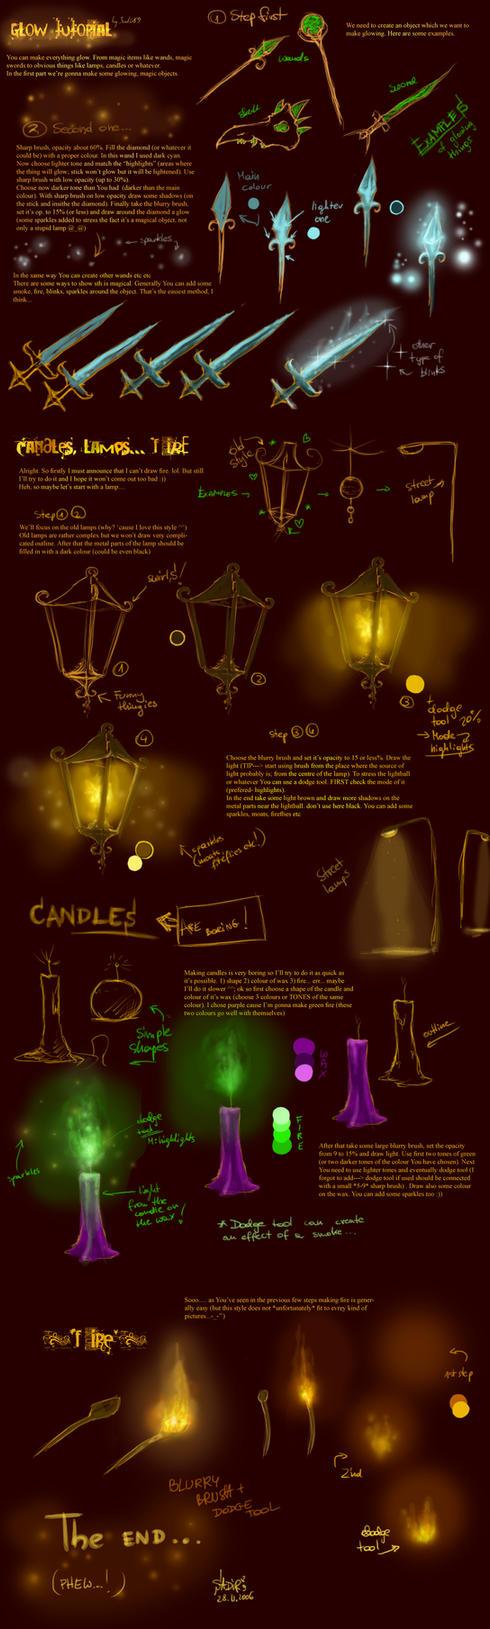 Glow tutorial by Sadir89